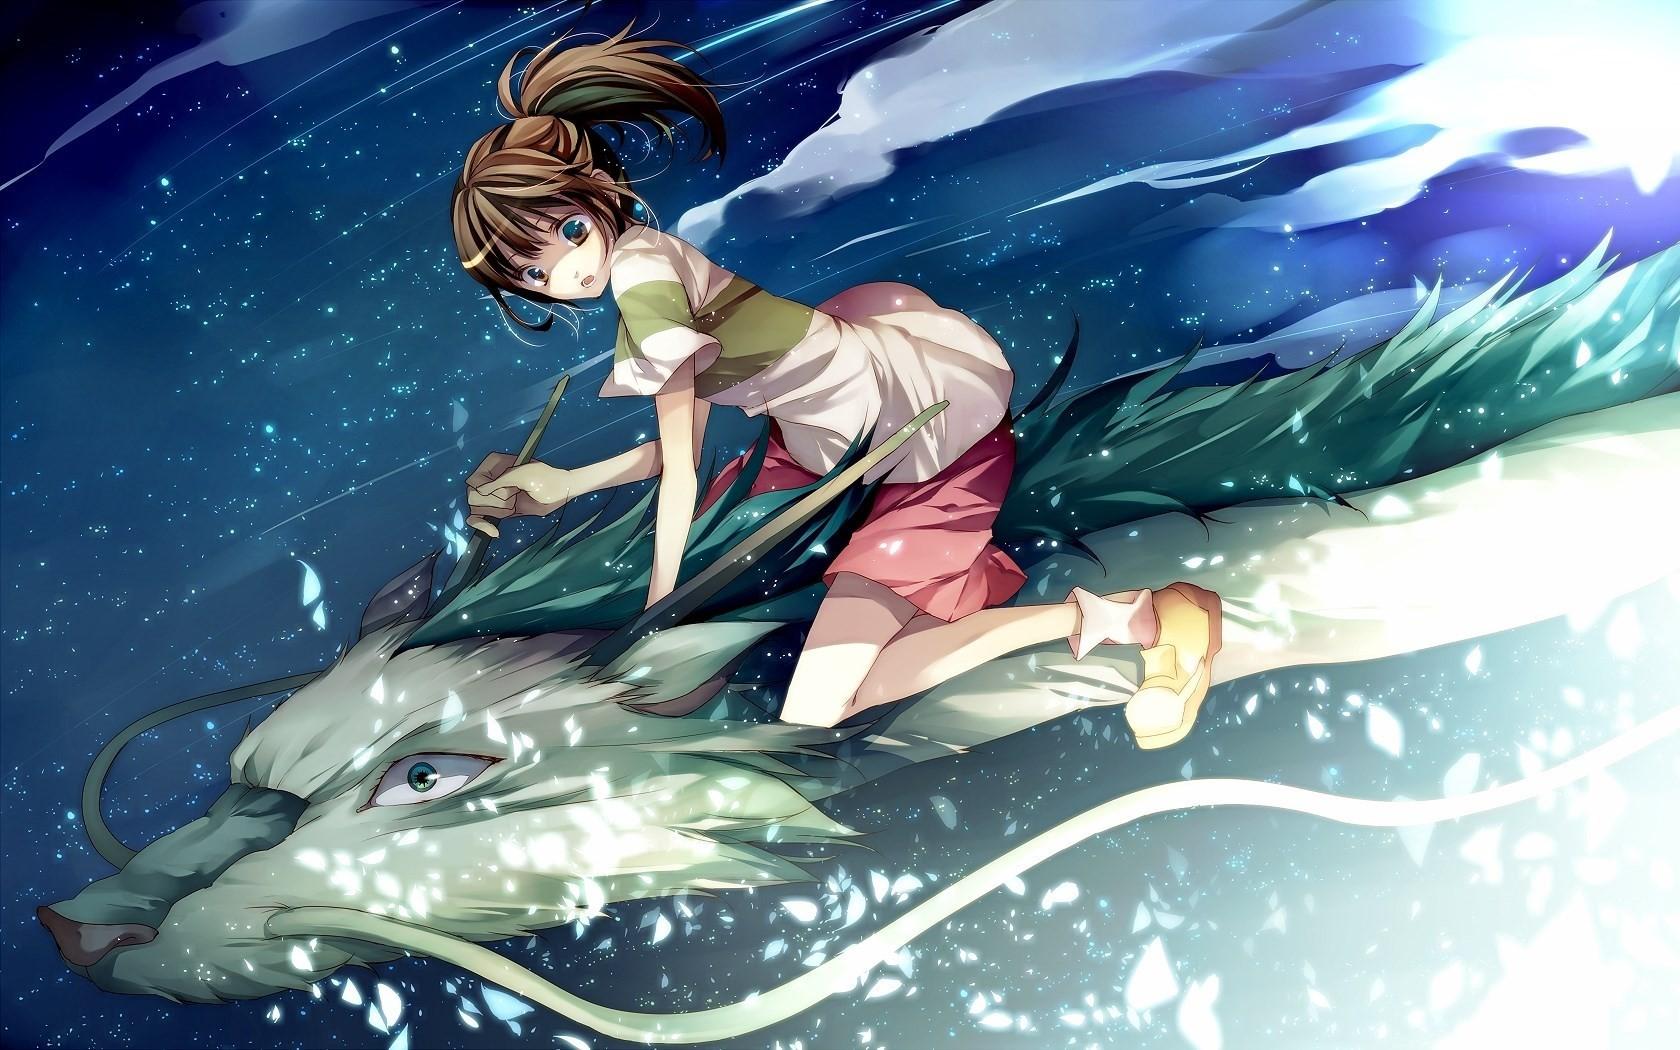 Illustration Anime Girls Spirited Away Dragon Computer Wallpaper Fictional Character